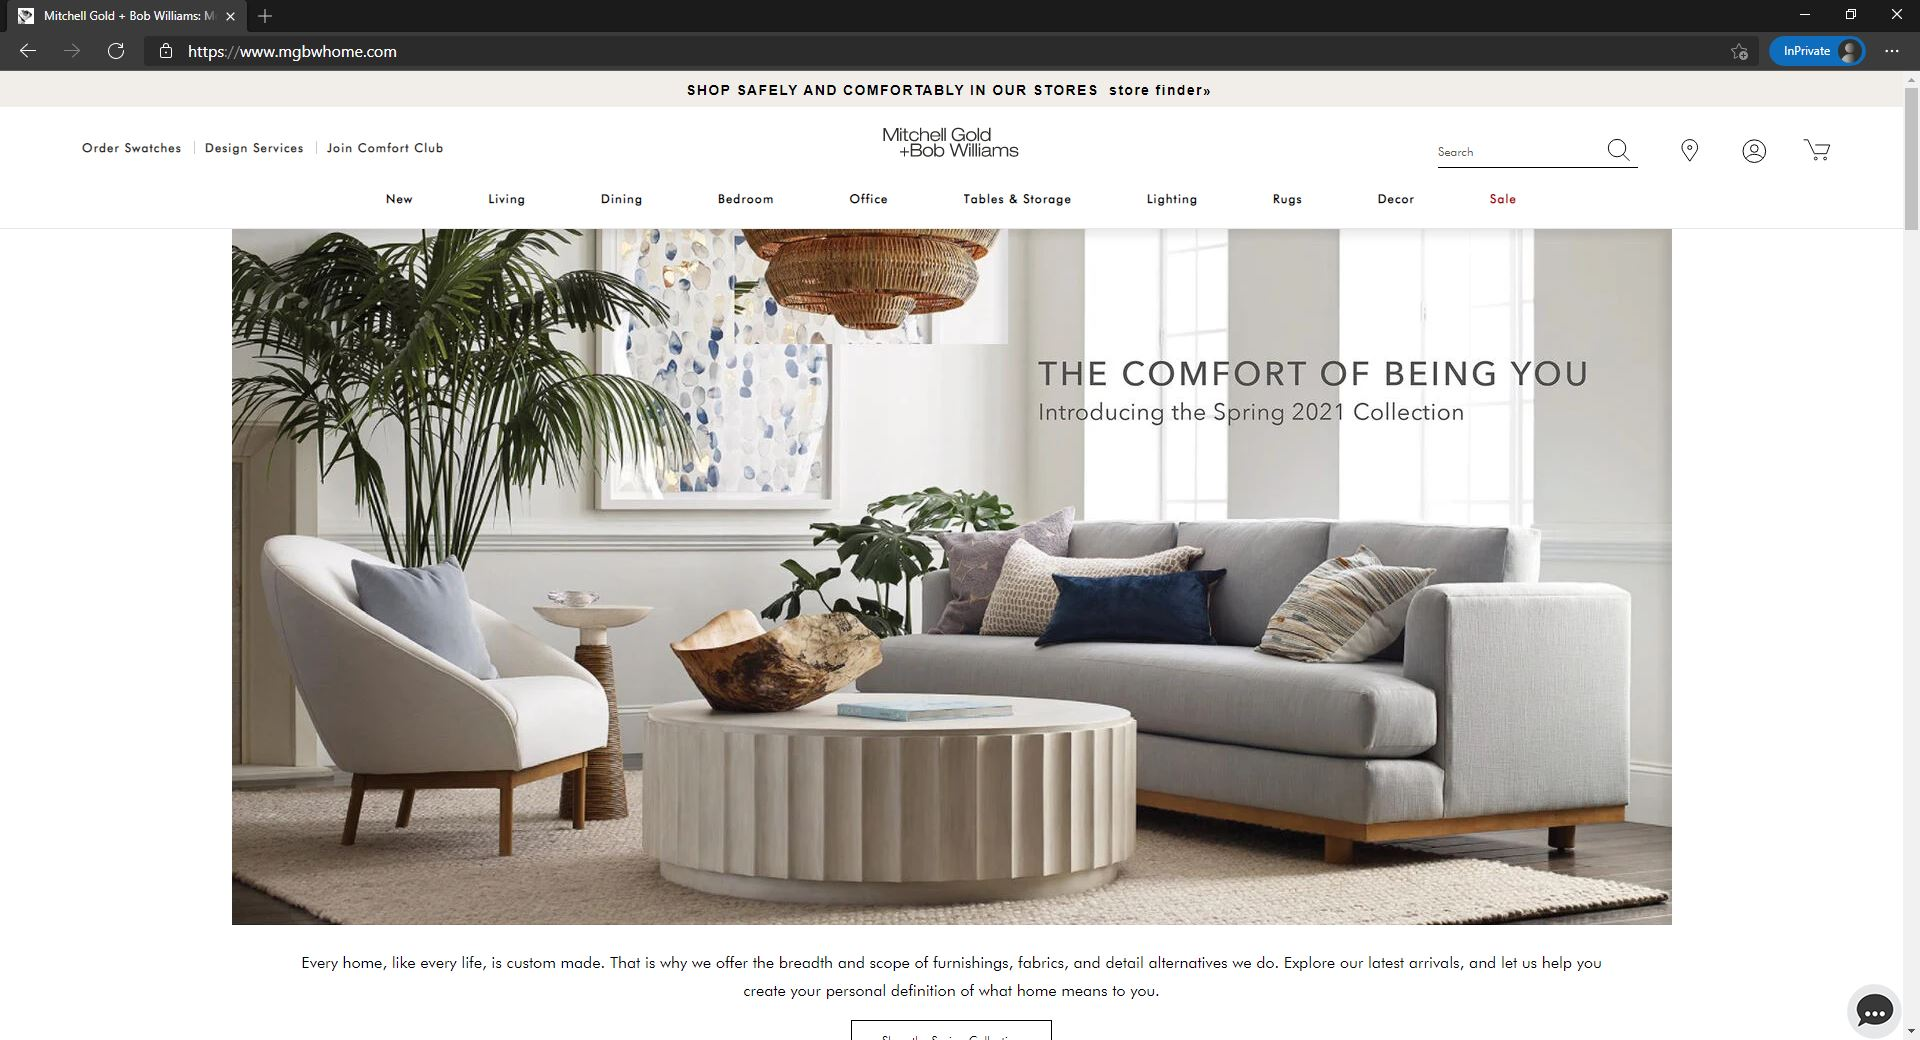 Mitchell Gold + Bob Williams website homepage